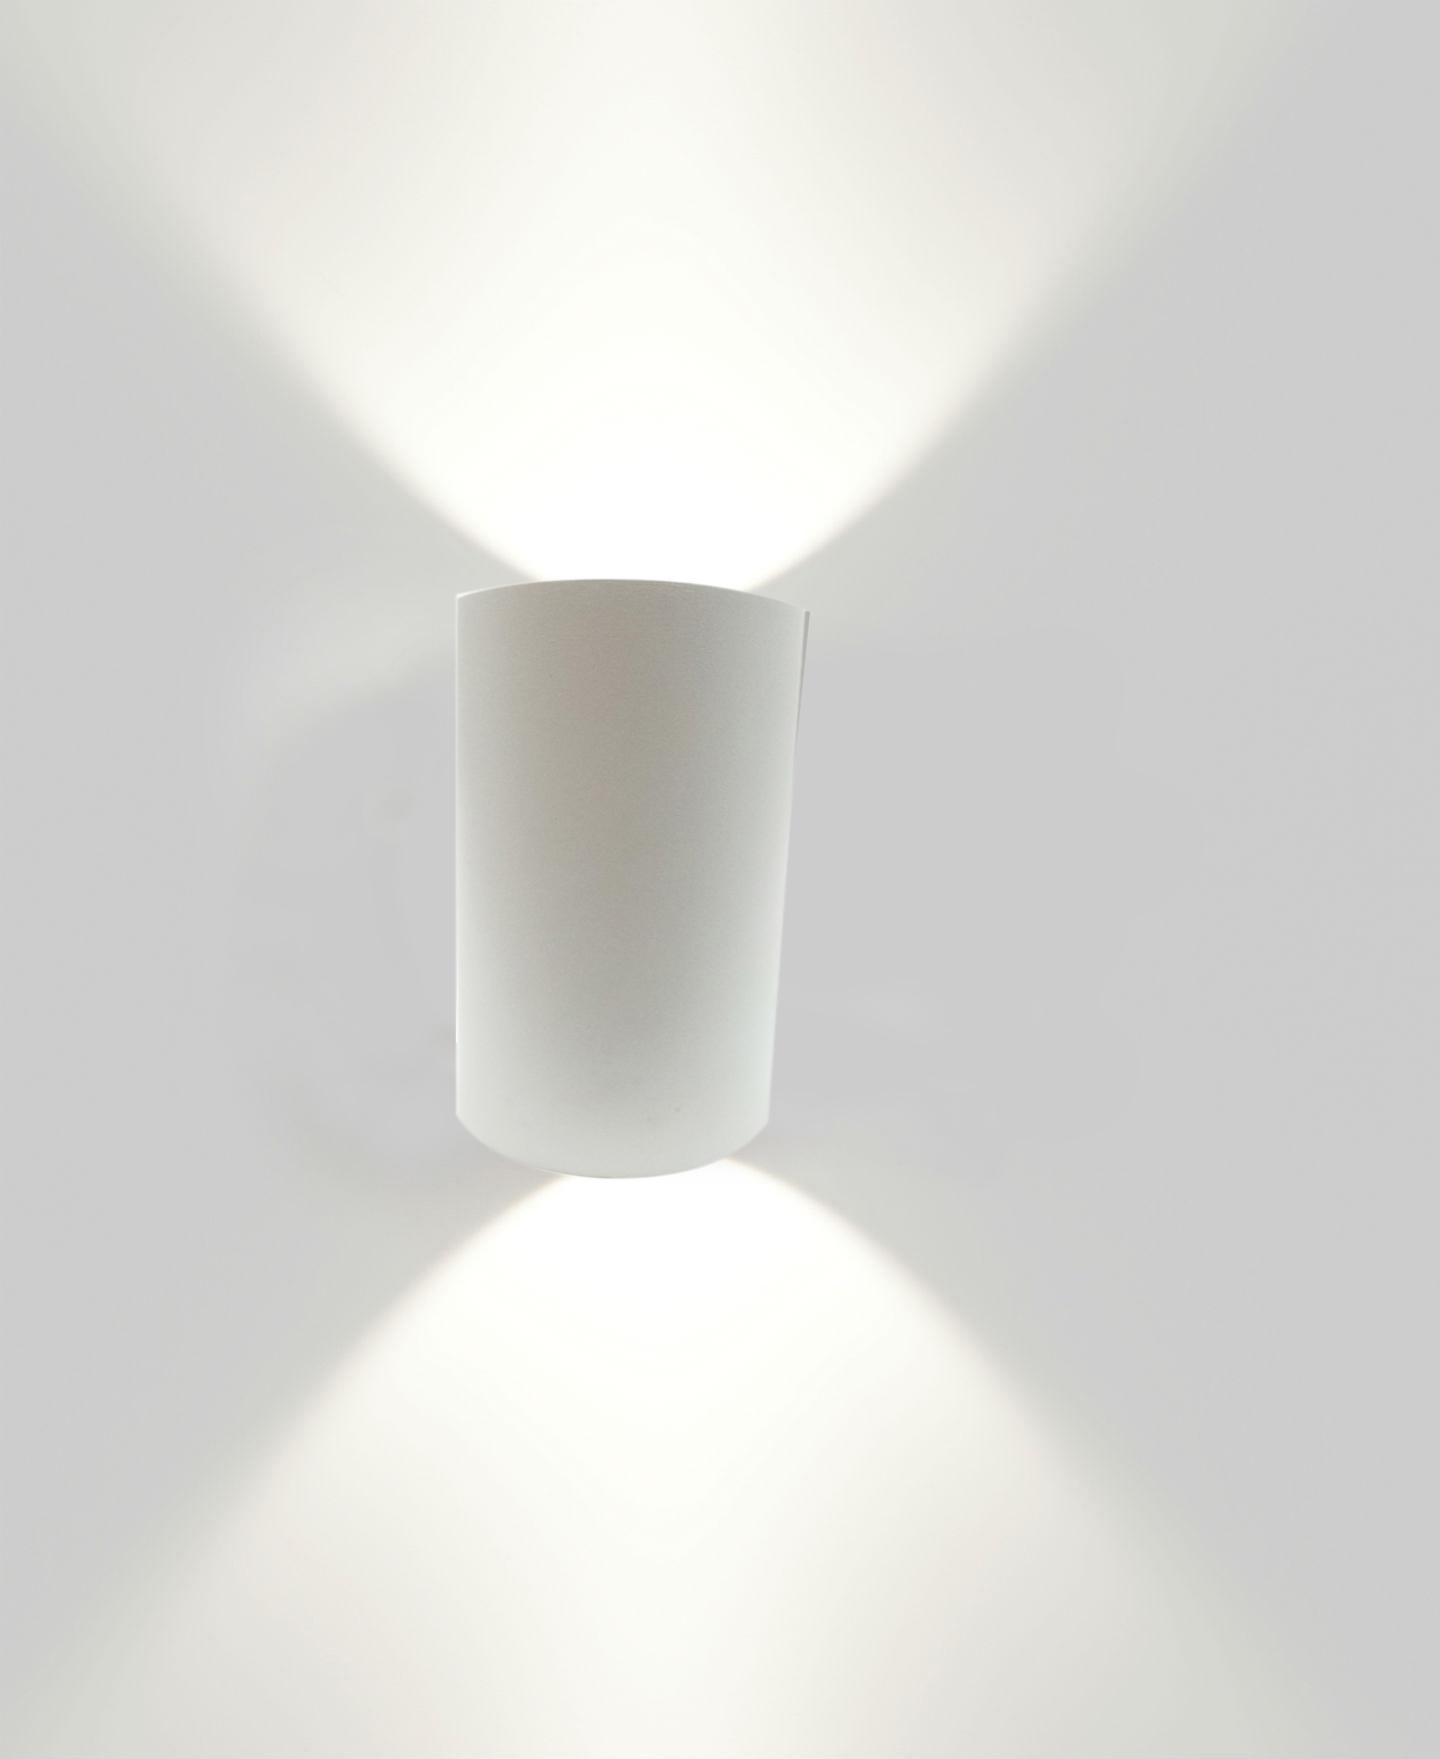 lampada led doppio luce applique led 10w da parete 230v. Black Bedroom Furniture Sets. Home Design Ideas